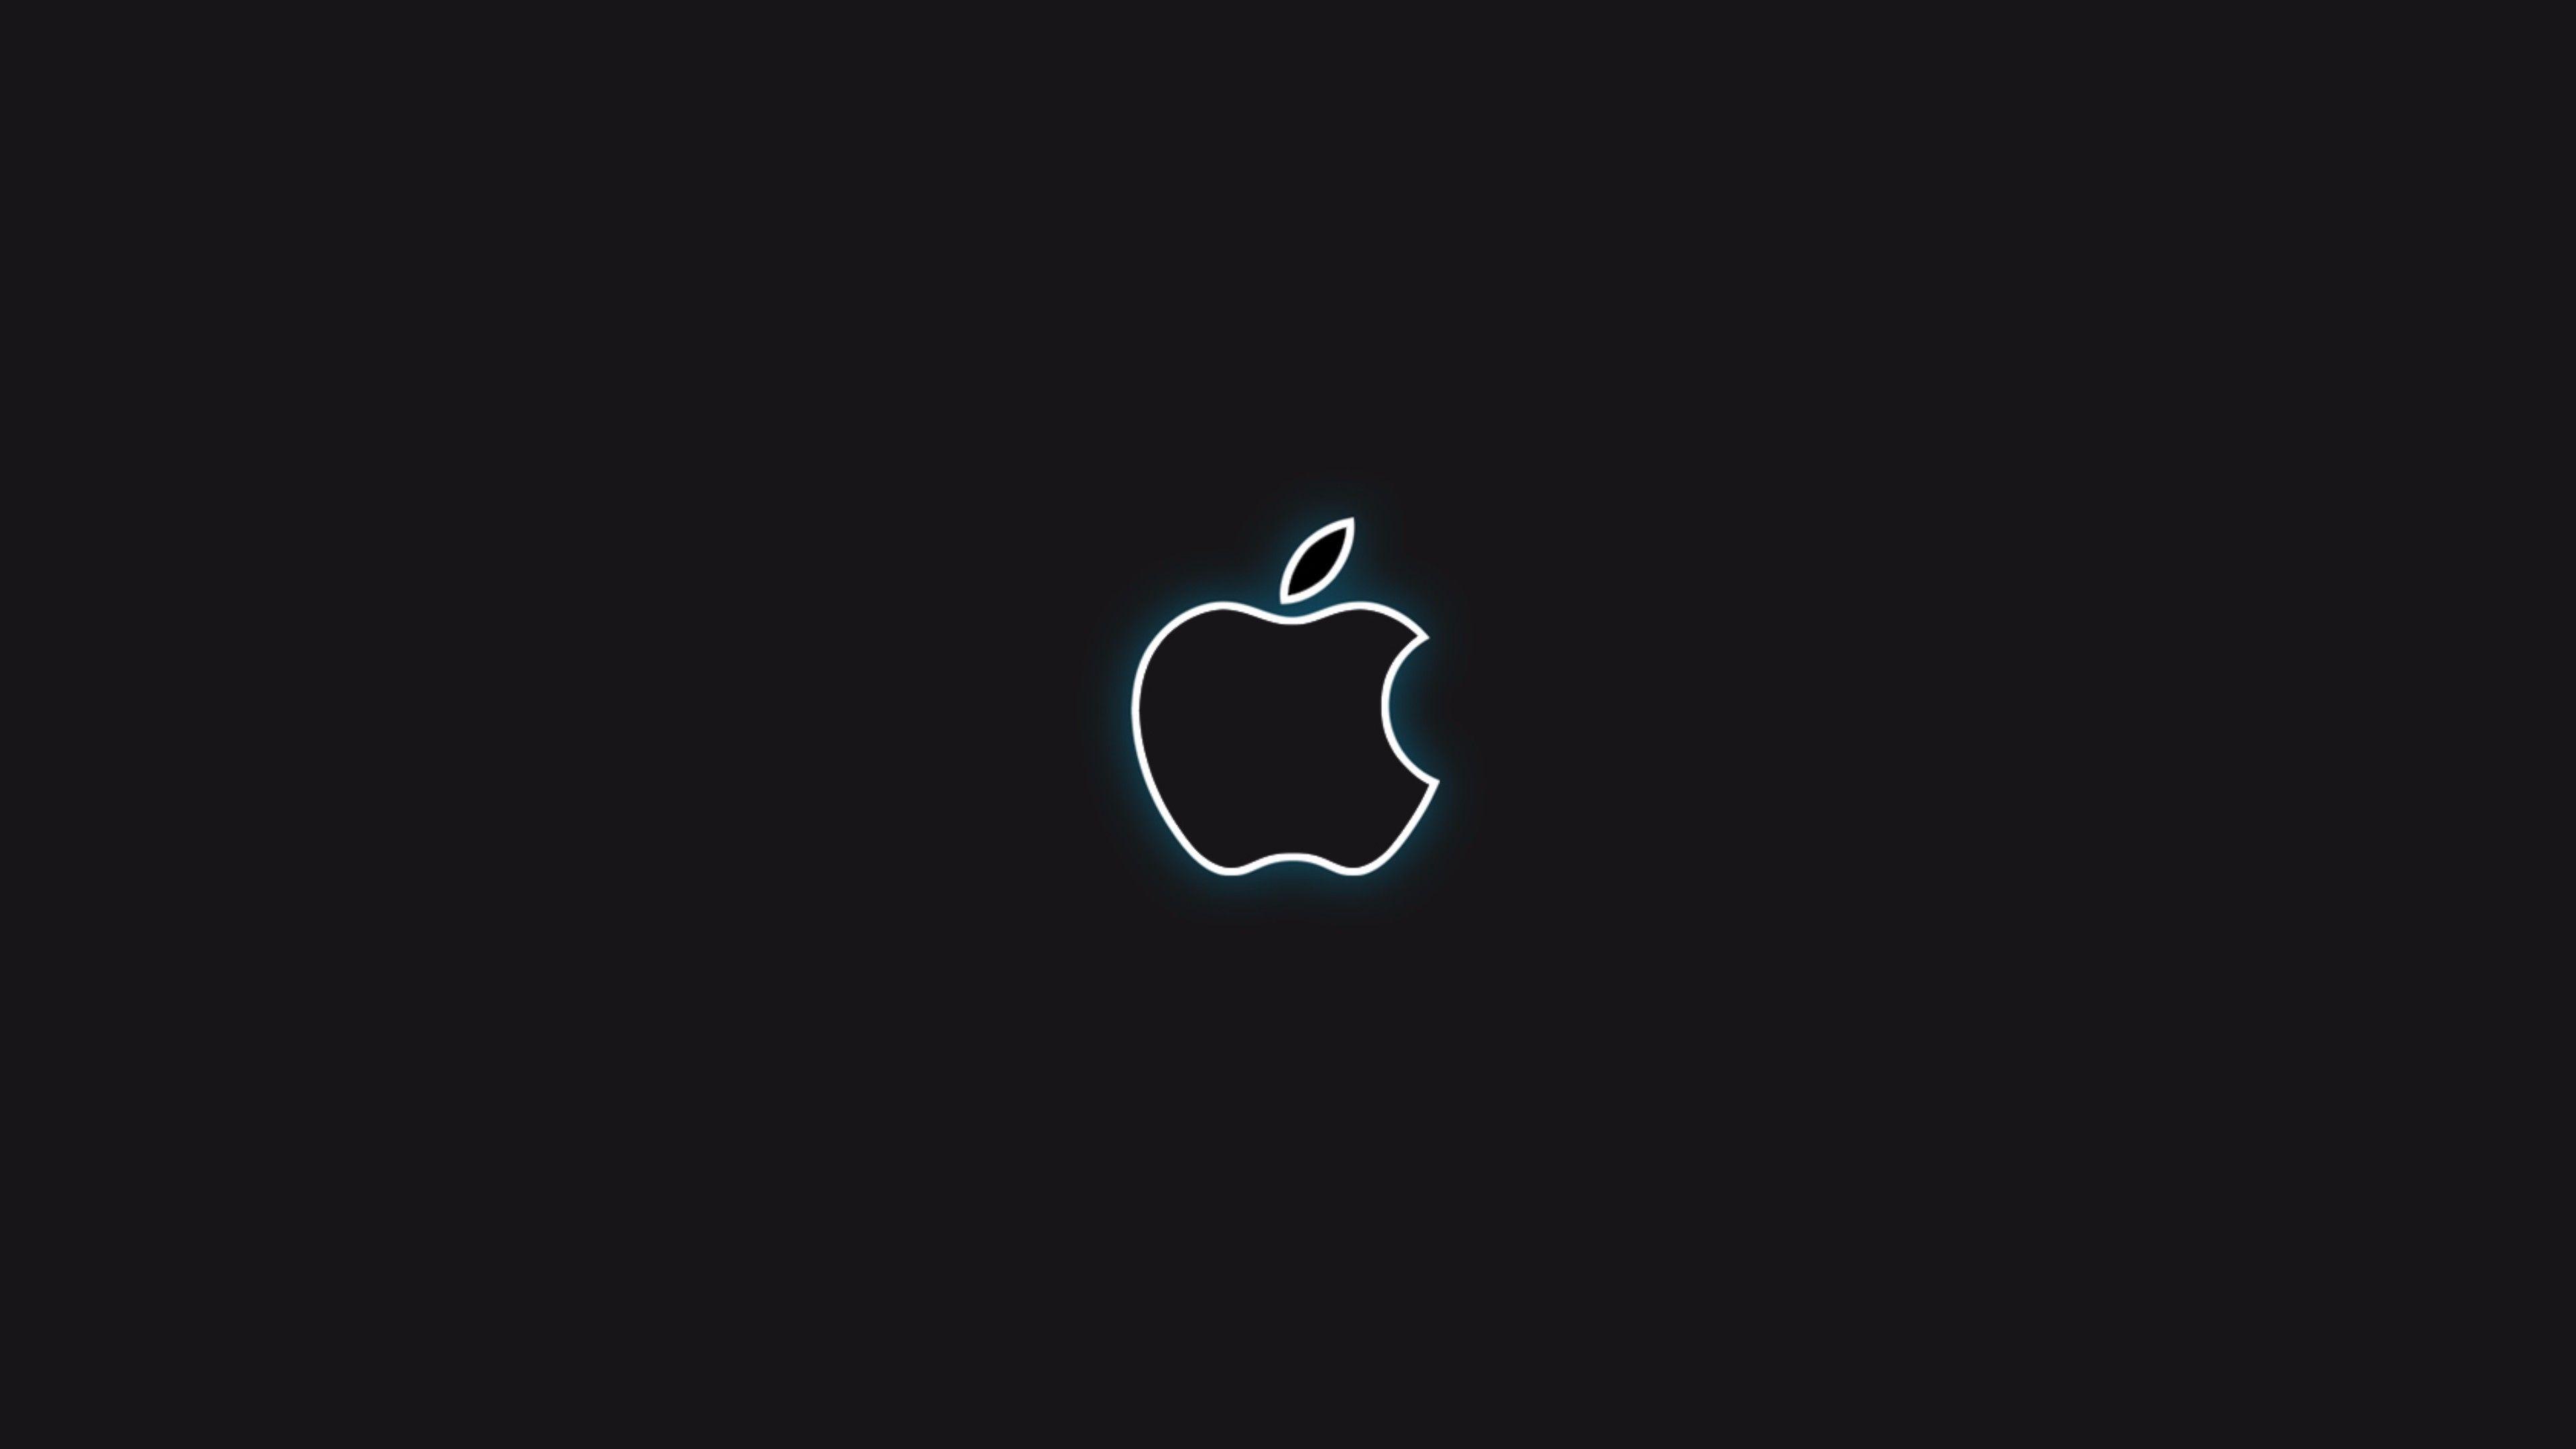 Apple 4k Uhd Wallpapers Top Free Apple 4k Uhd Backgrounds Wallpaperaccess Black Apple Logo Black Apple Wallpaper Apple Logo Wallpaper